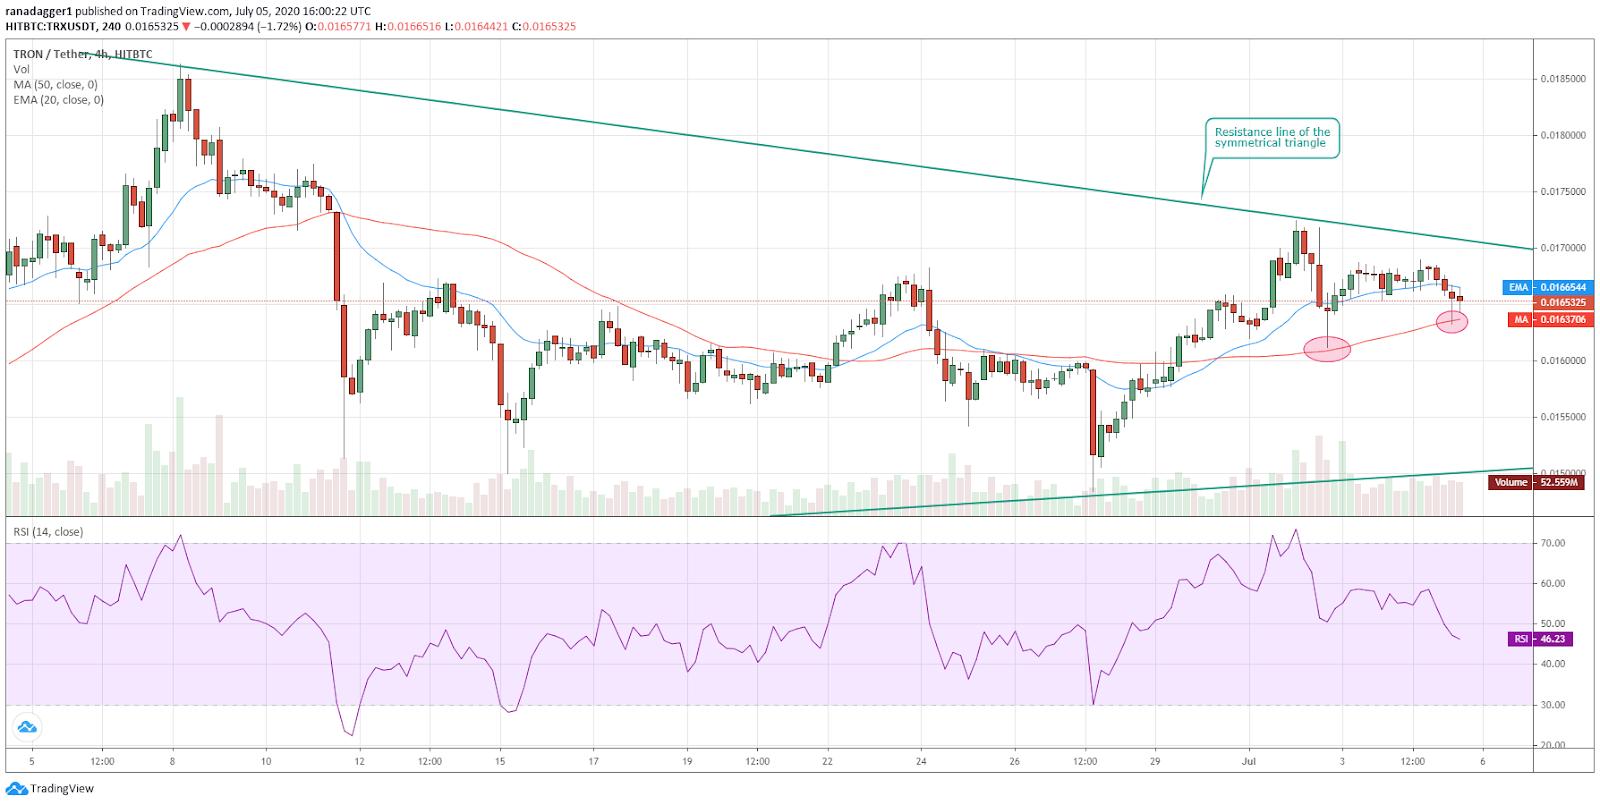 TRX/USD 4-hour chart. Source: Tradingview